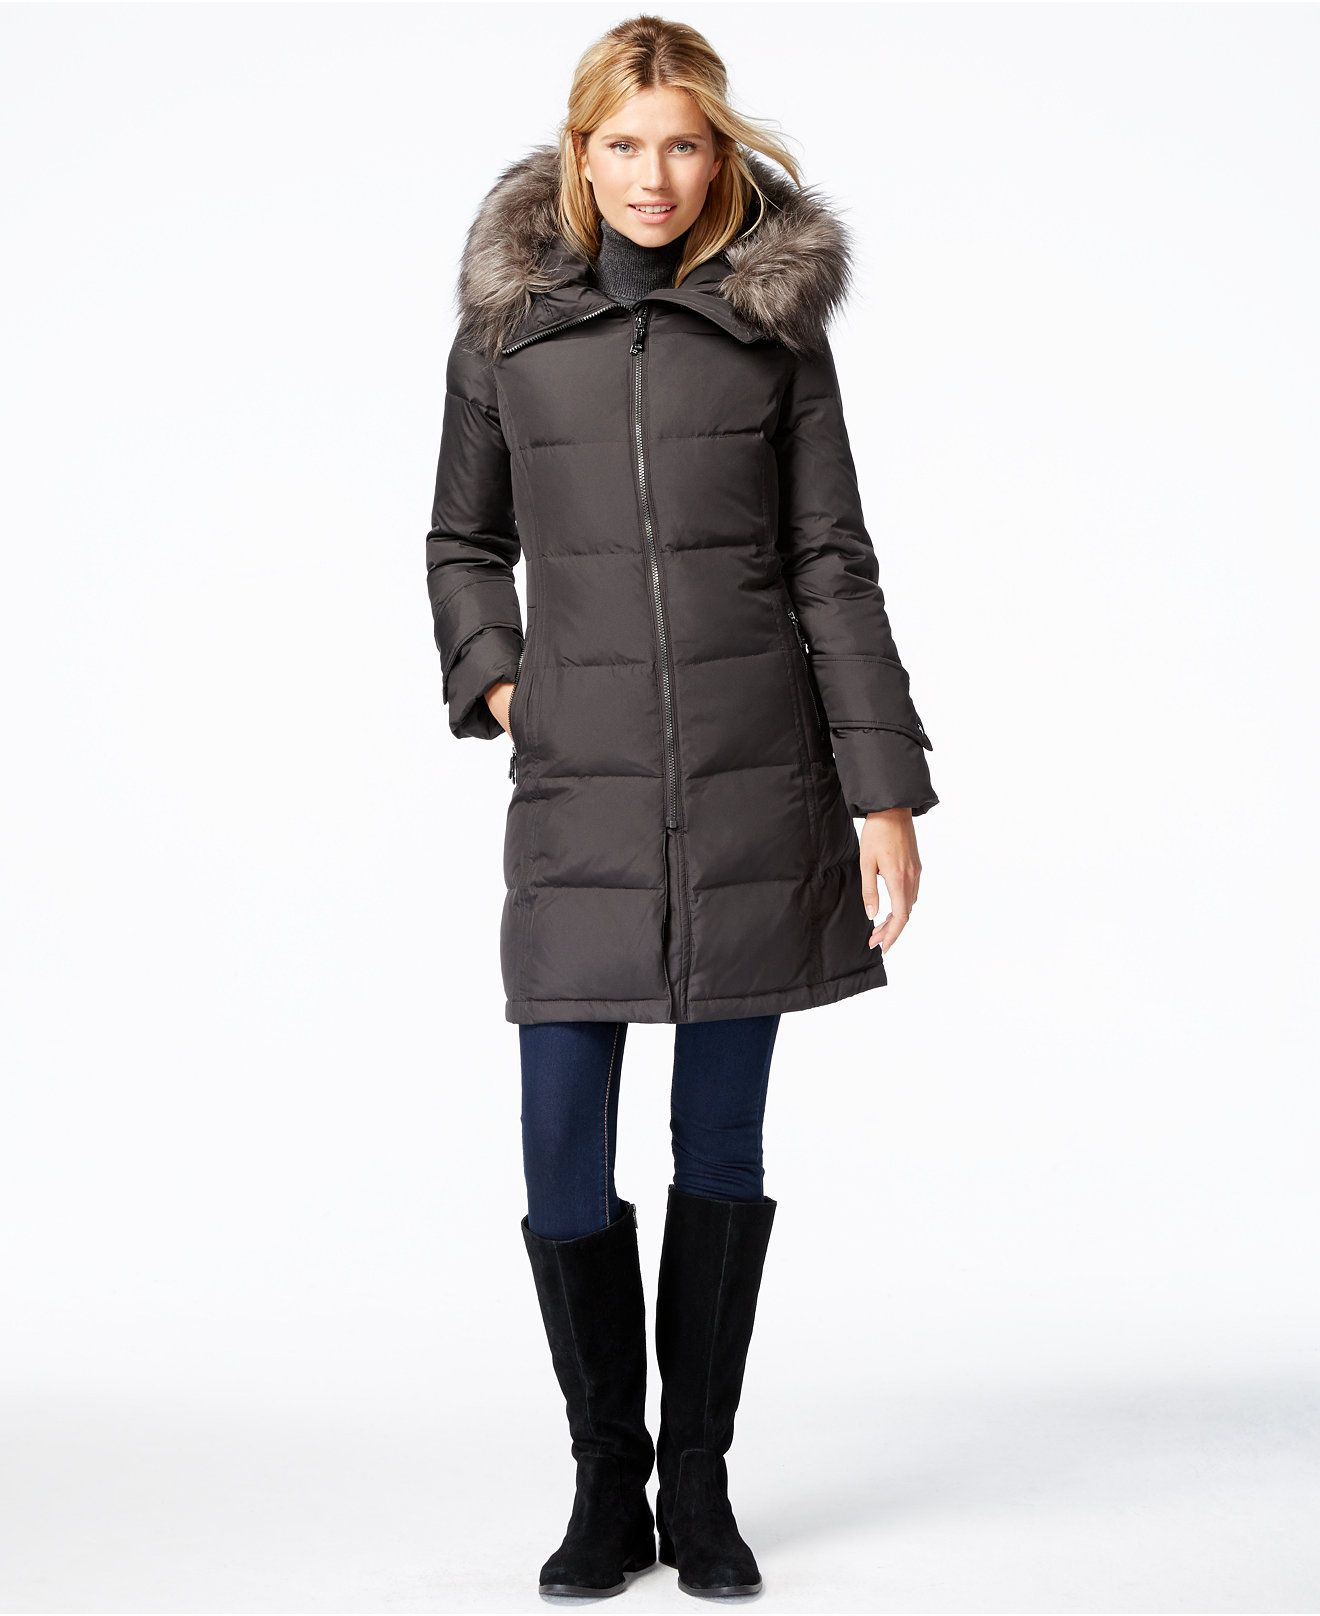 Calvin Klein Faux Fur Trim Puffer Down Jacket Coats Women Macy S Coats For Women Jackets Down Jacket [ 1616 x 1320 Pixel ]